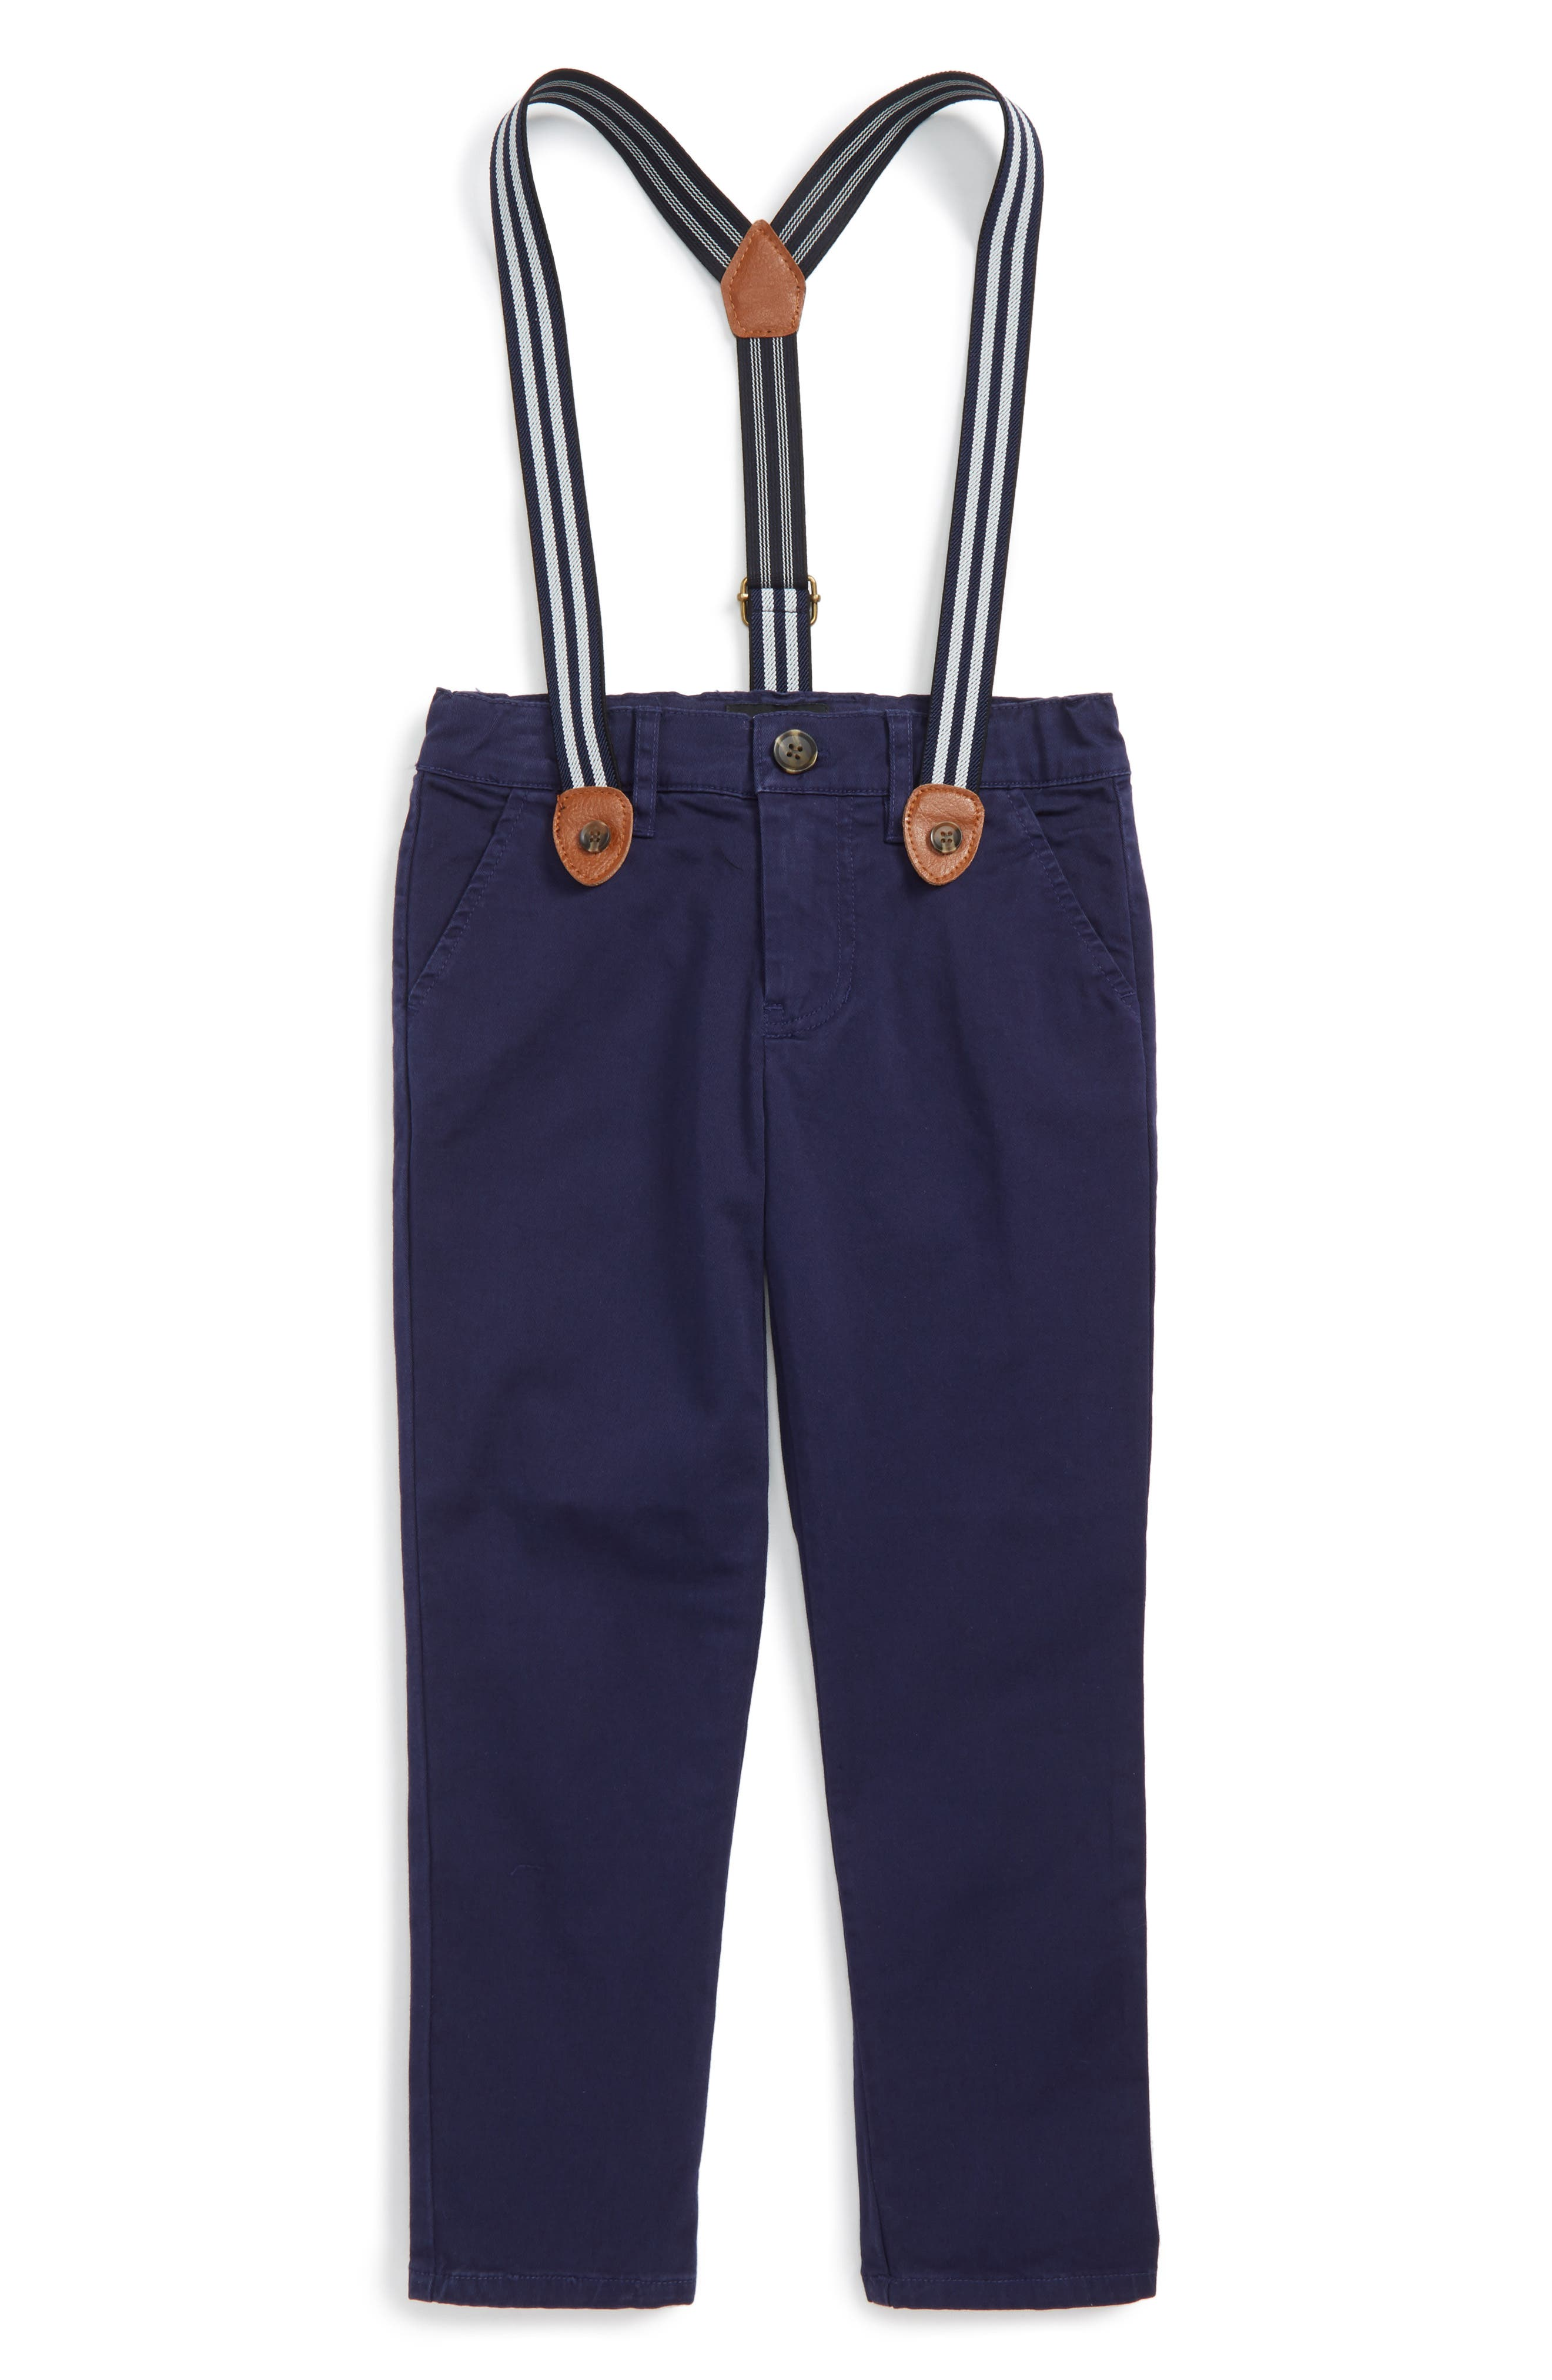 Chinos & Suspenders Set,                         Main,                         color, Midnight